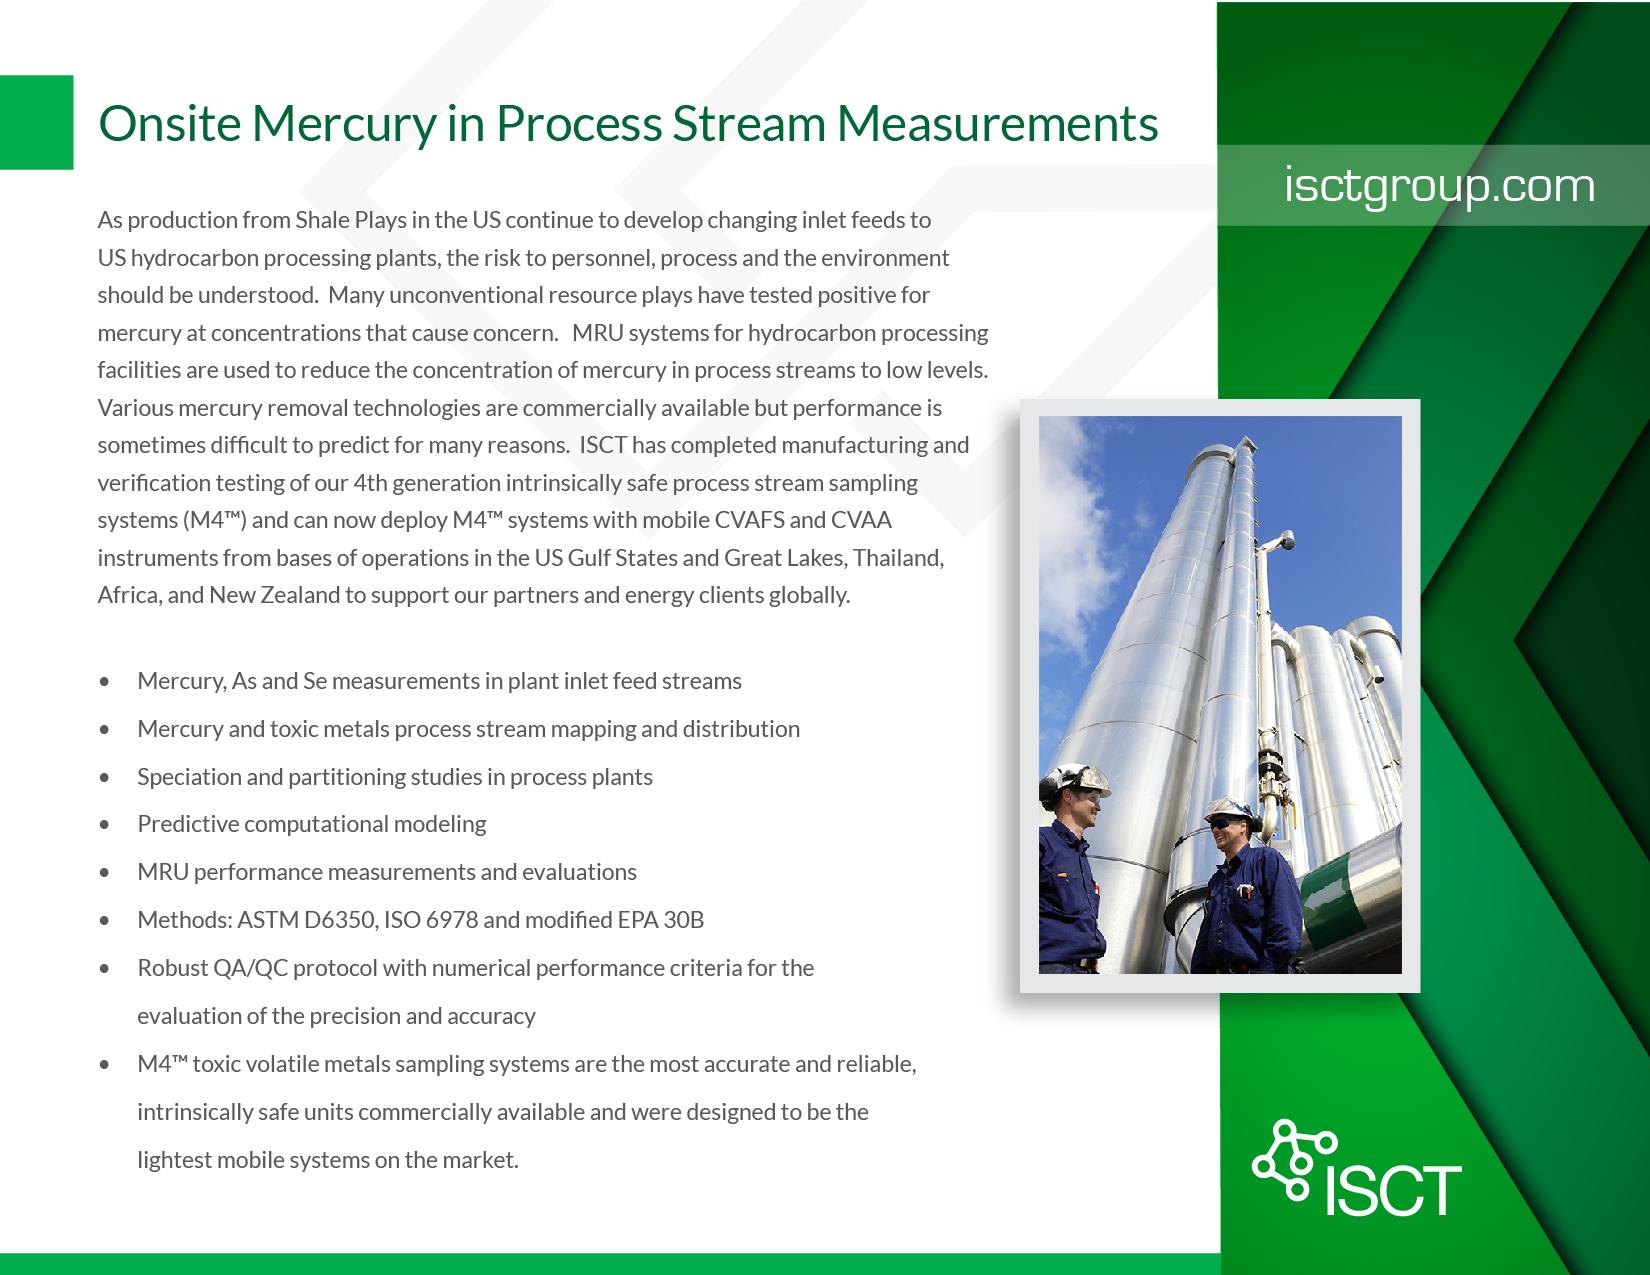 Onsite Mercury in Process Stream Measurements